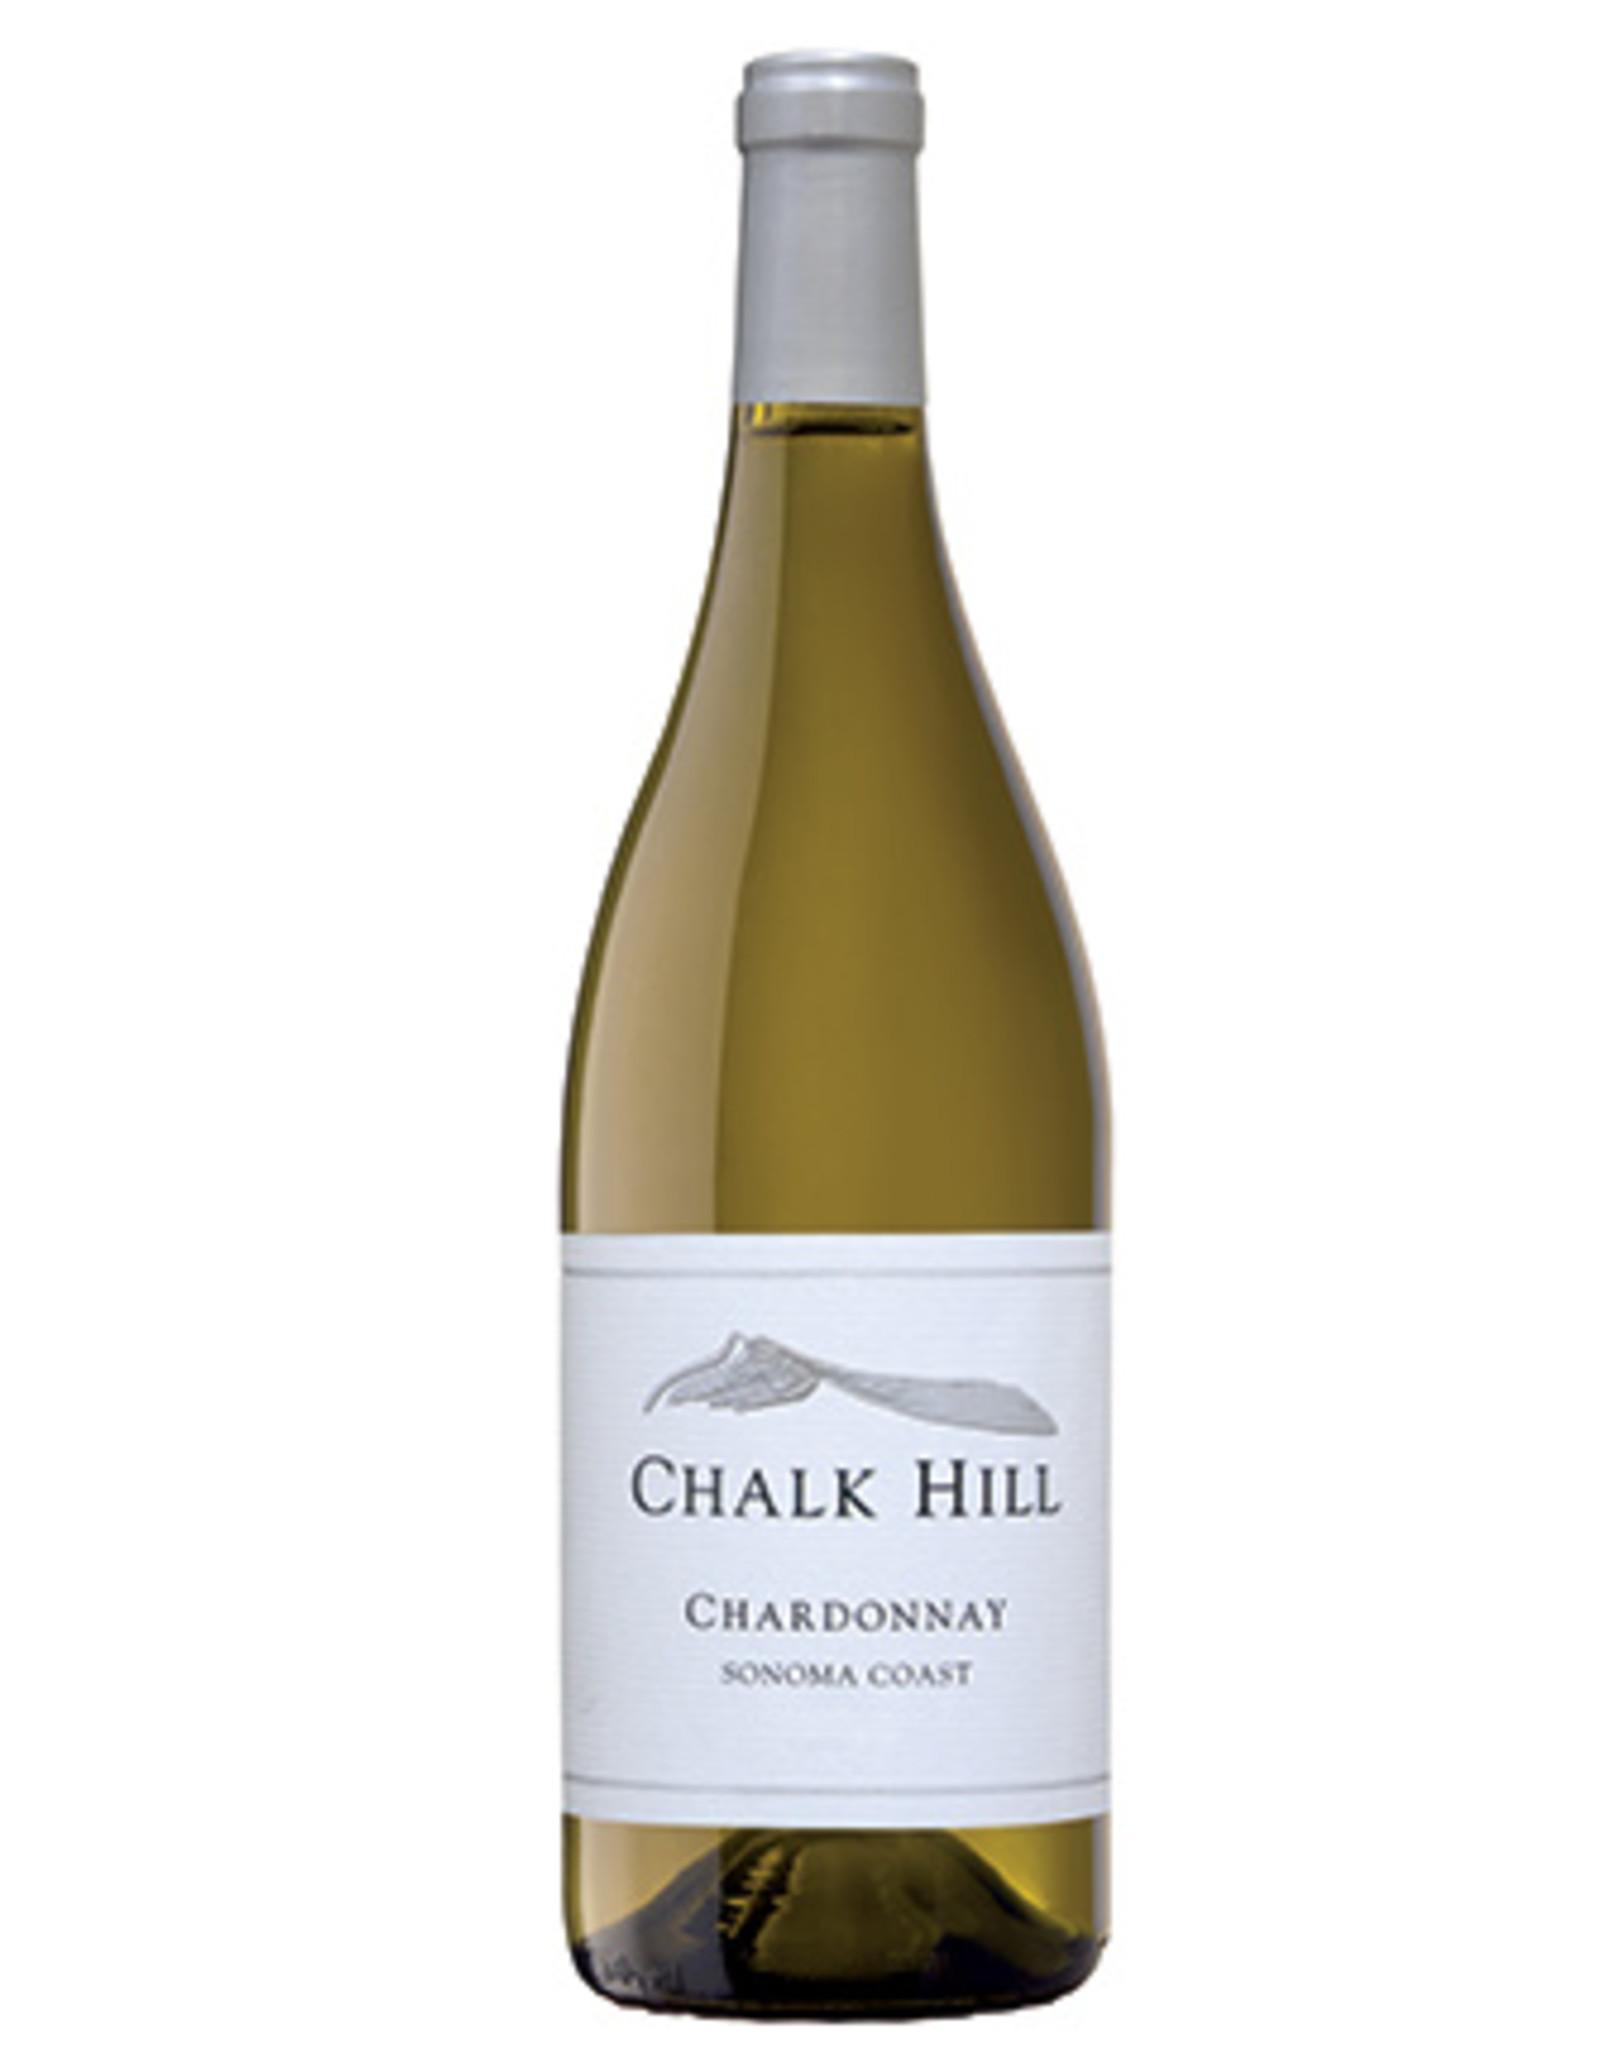 Chalk Hill Sonoma Coast Chardonnay